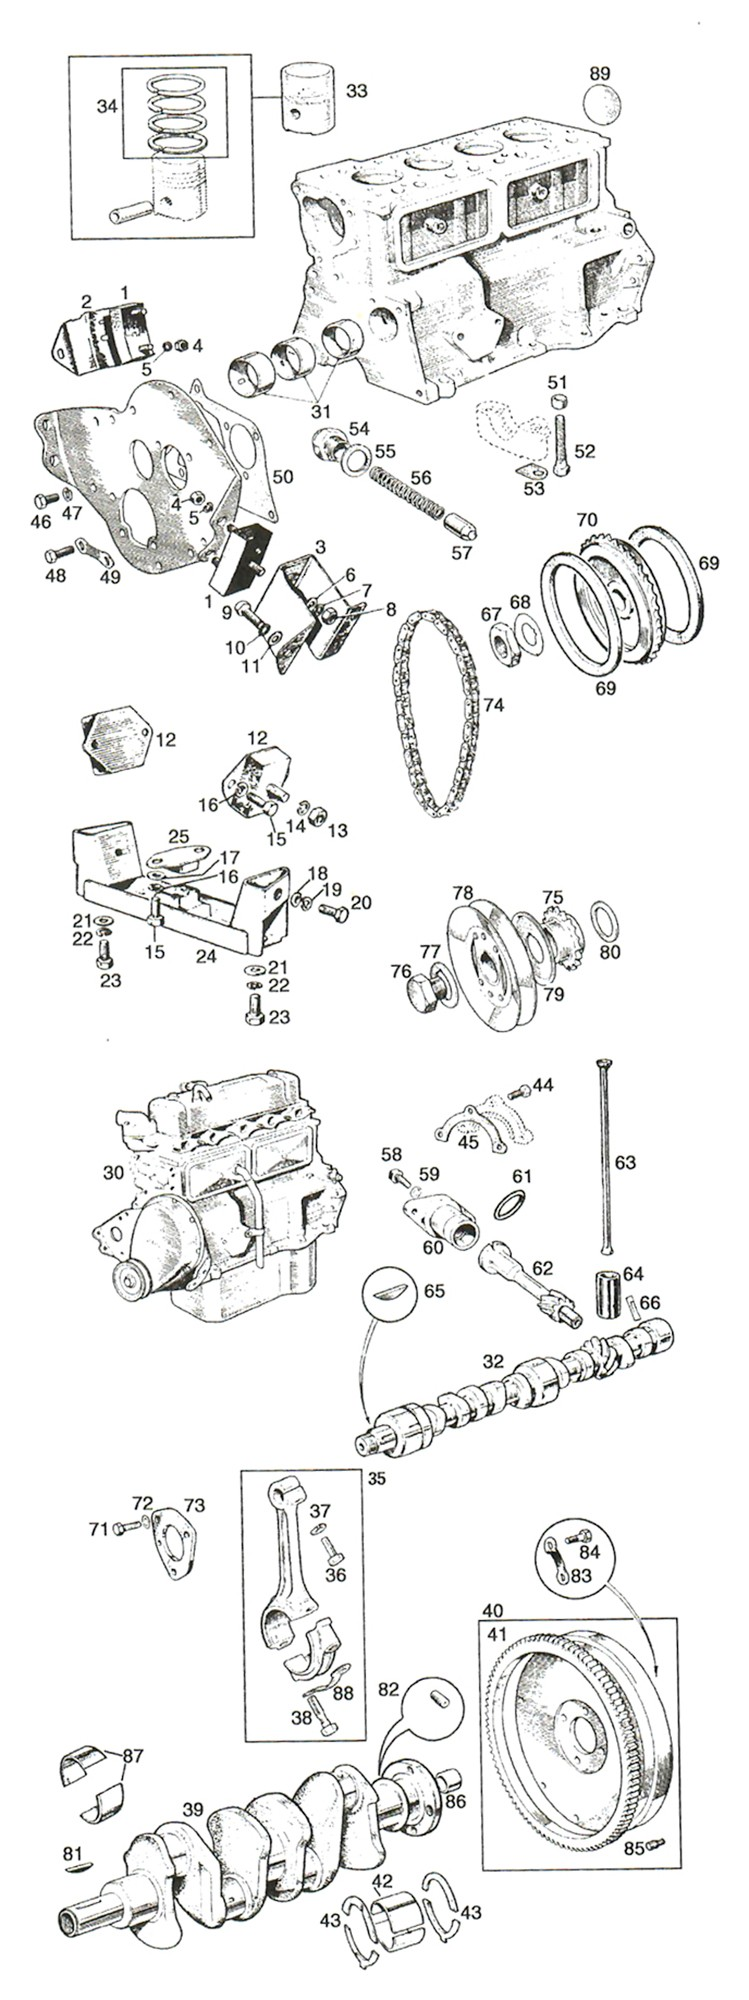 Mini Cooper Engine Diagram Wiring Diagram Information Information Musikami It